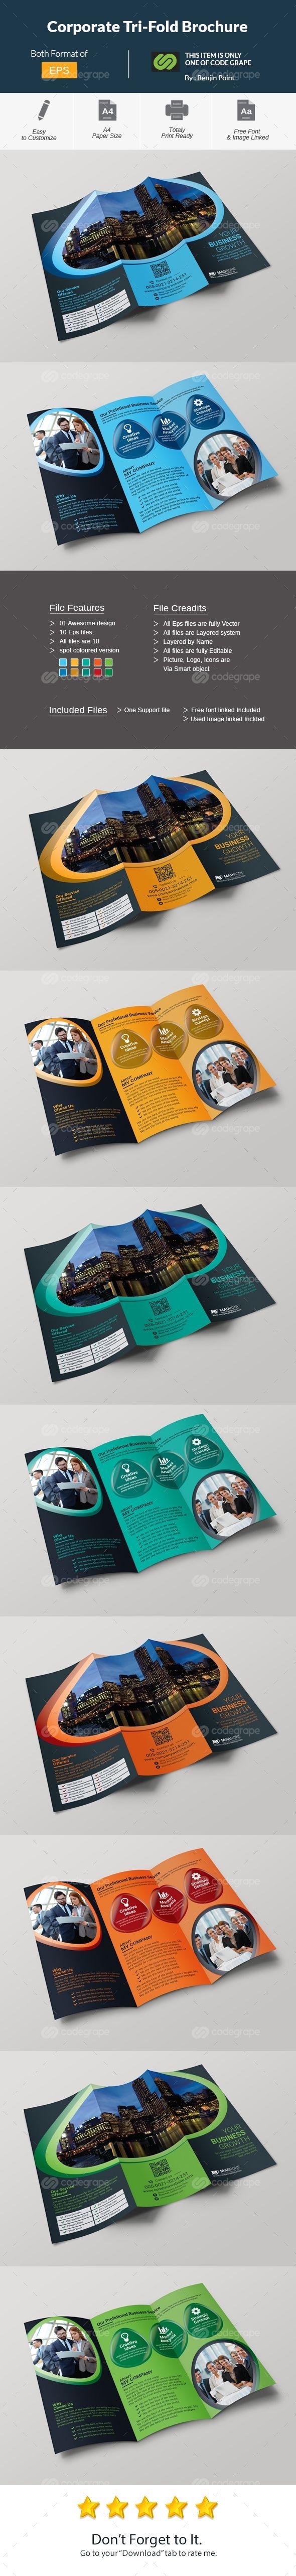 Corporate Tri-Fold Brochure on @codegrape. More Info: https://www.codegrape.com/item/corporate-tri-fold-brochure/10828